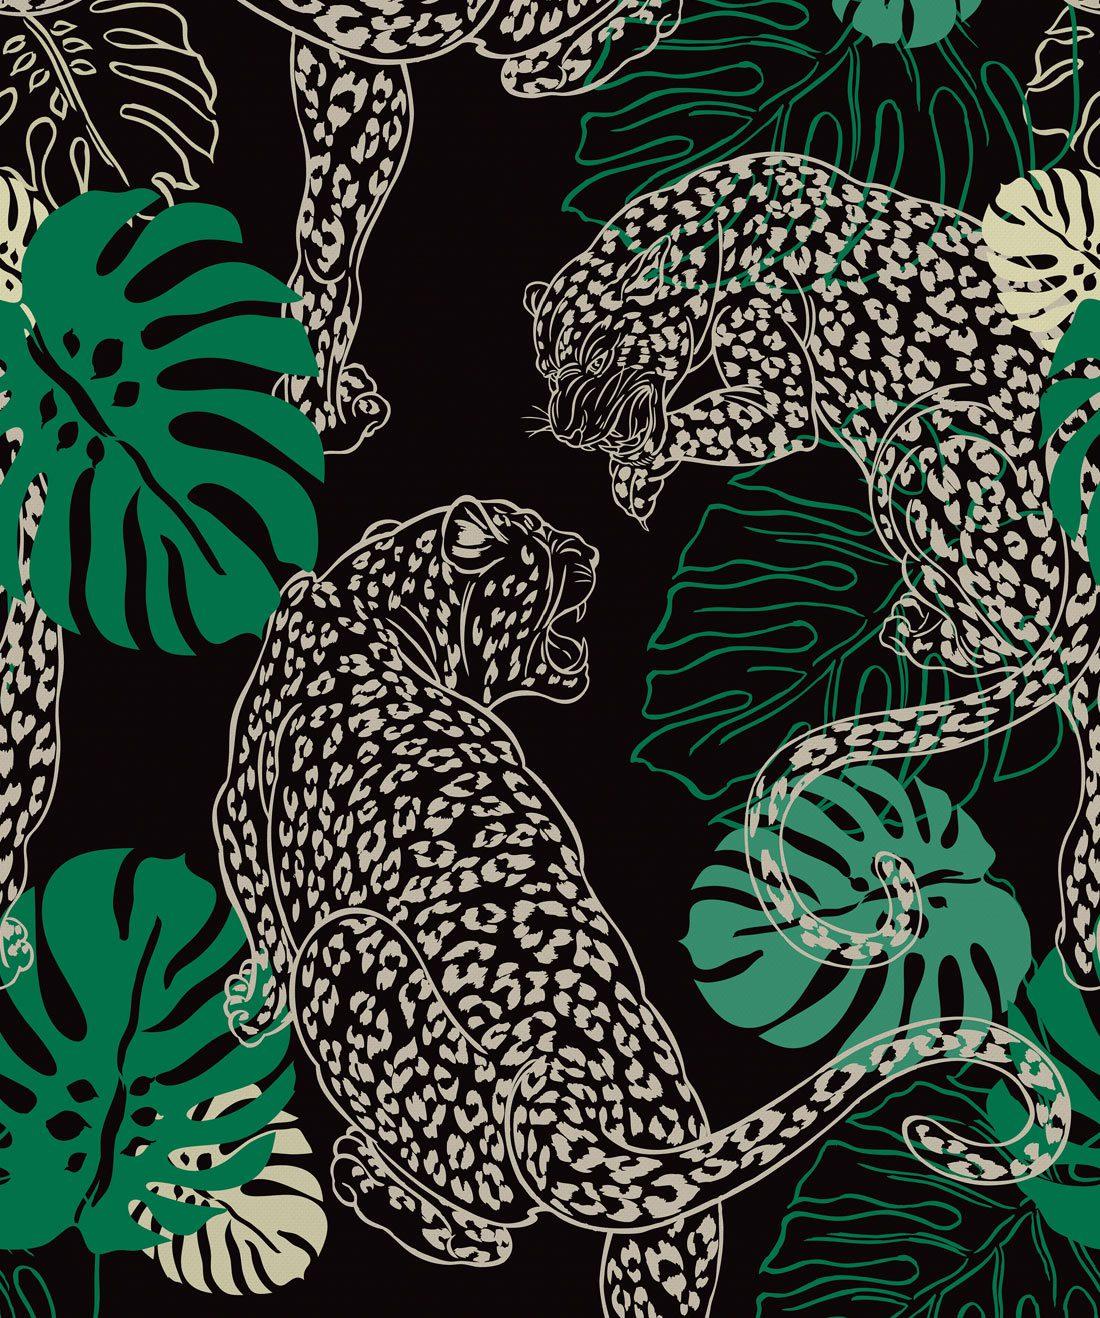 Leopard Amazon